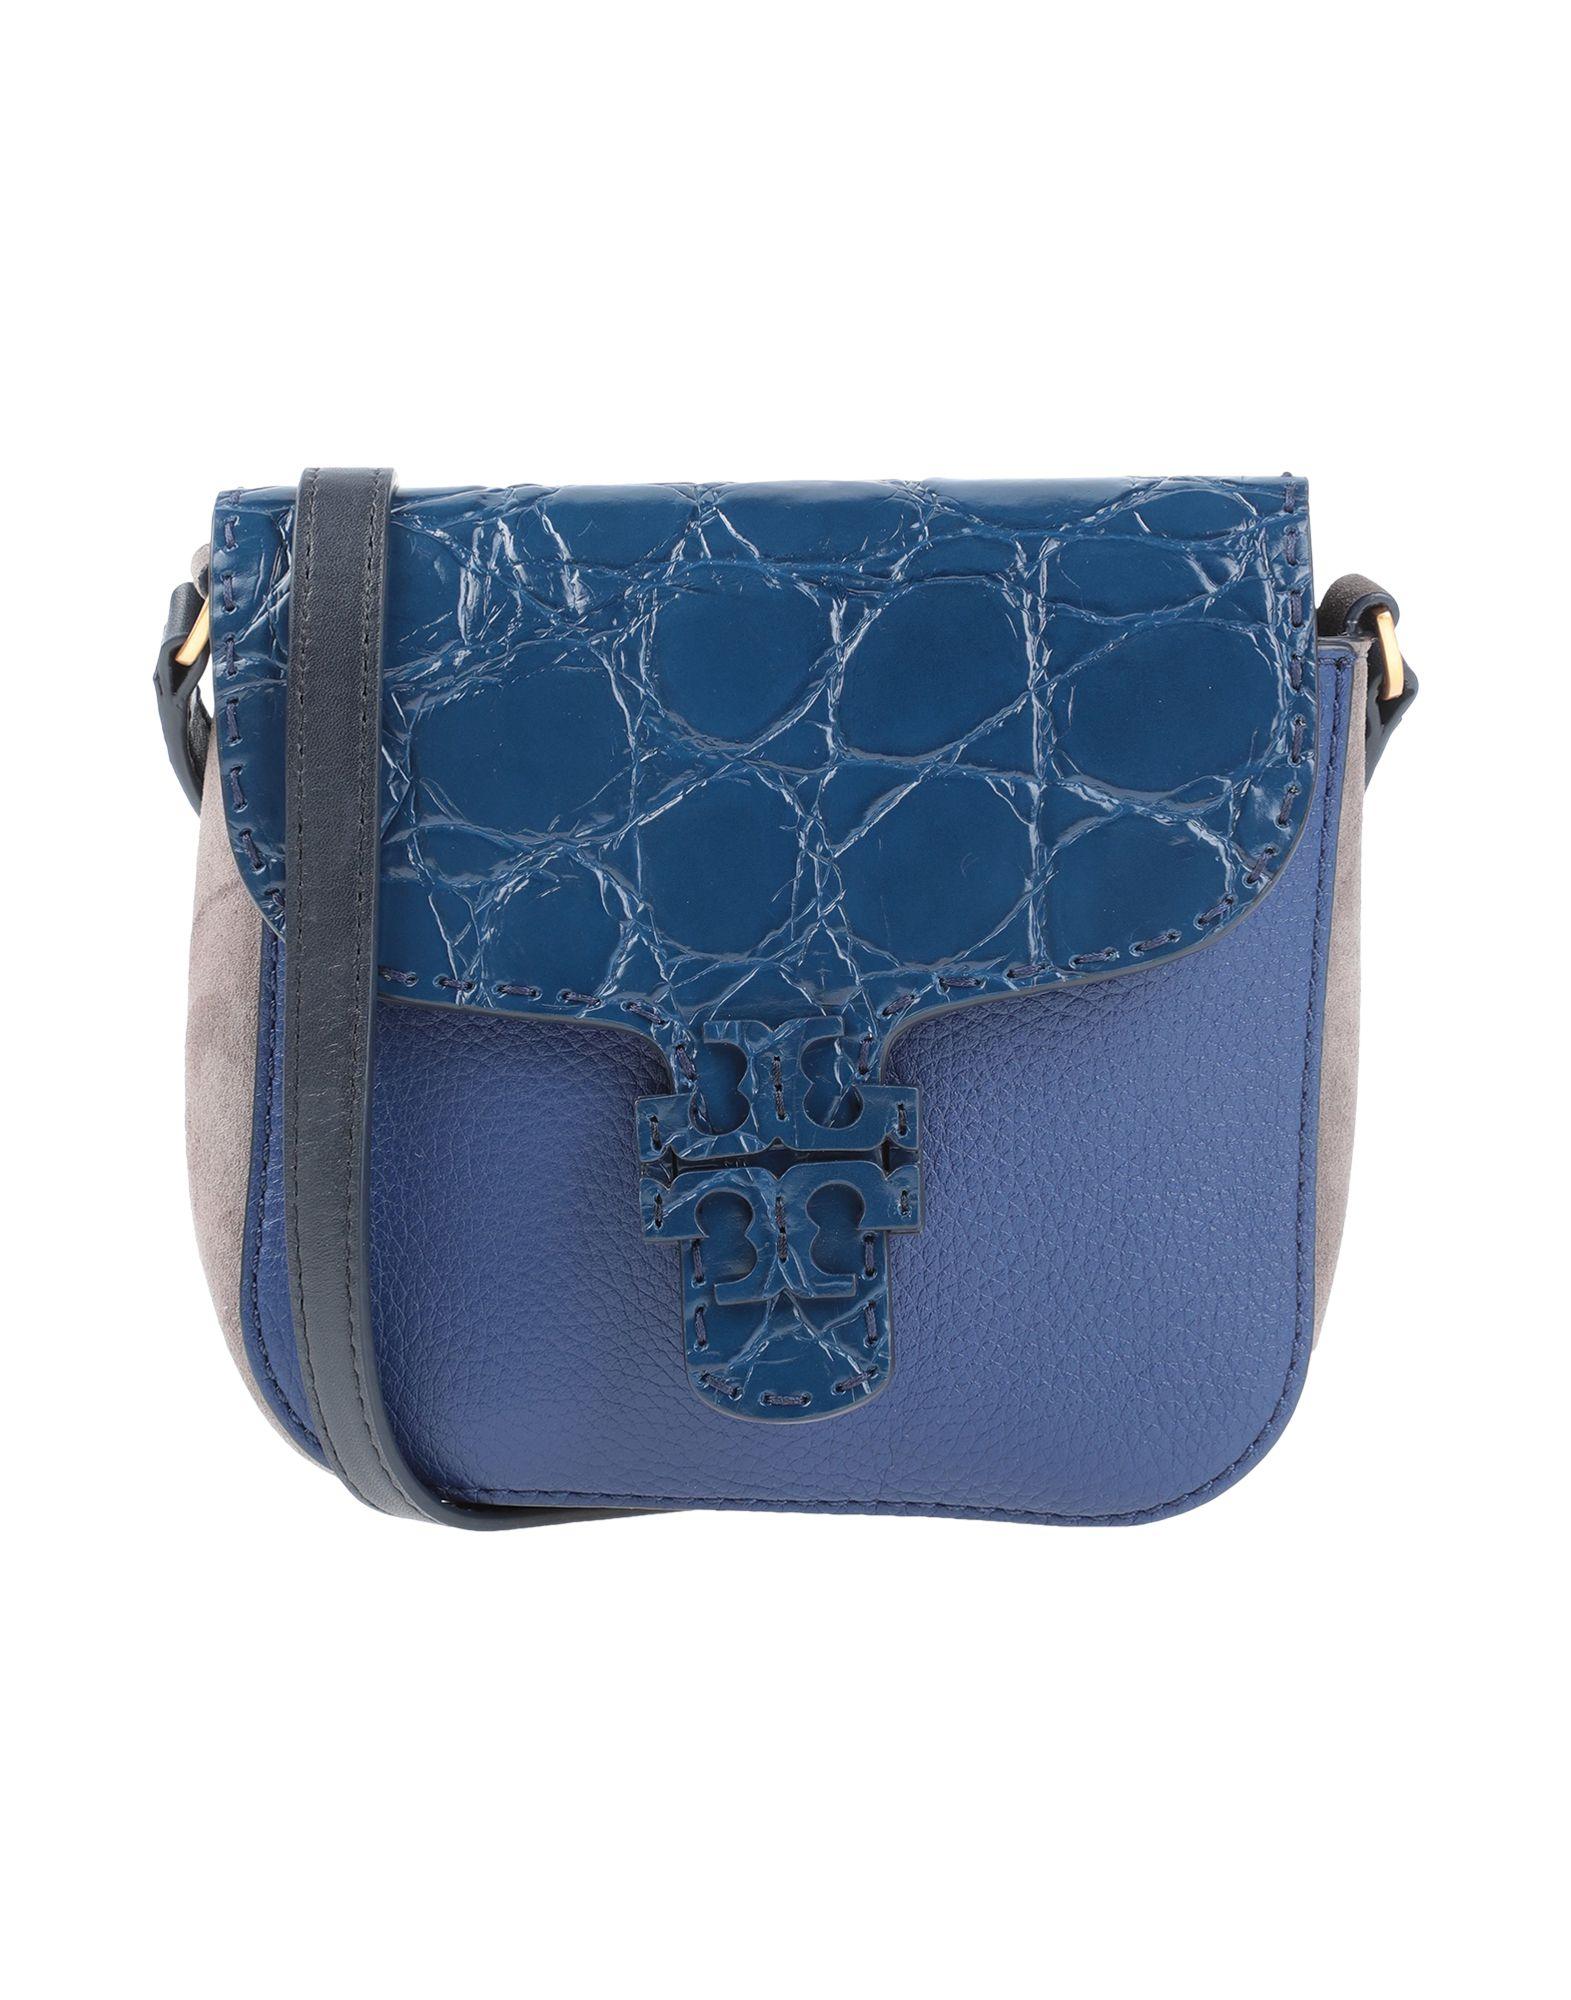 TORY BURCH Cross-body bags - Item 45508438